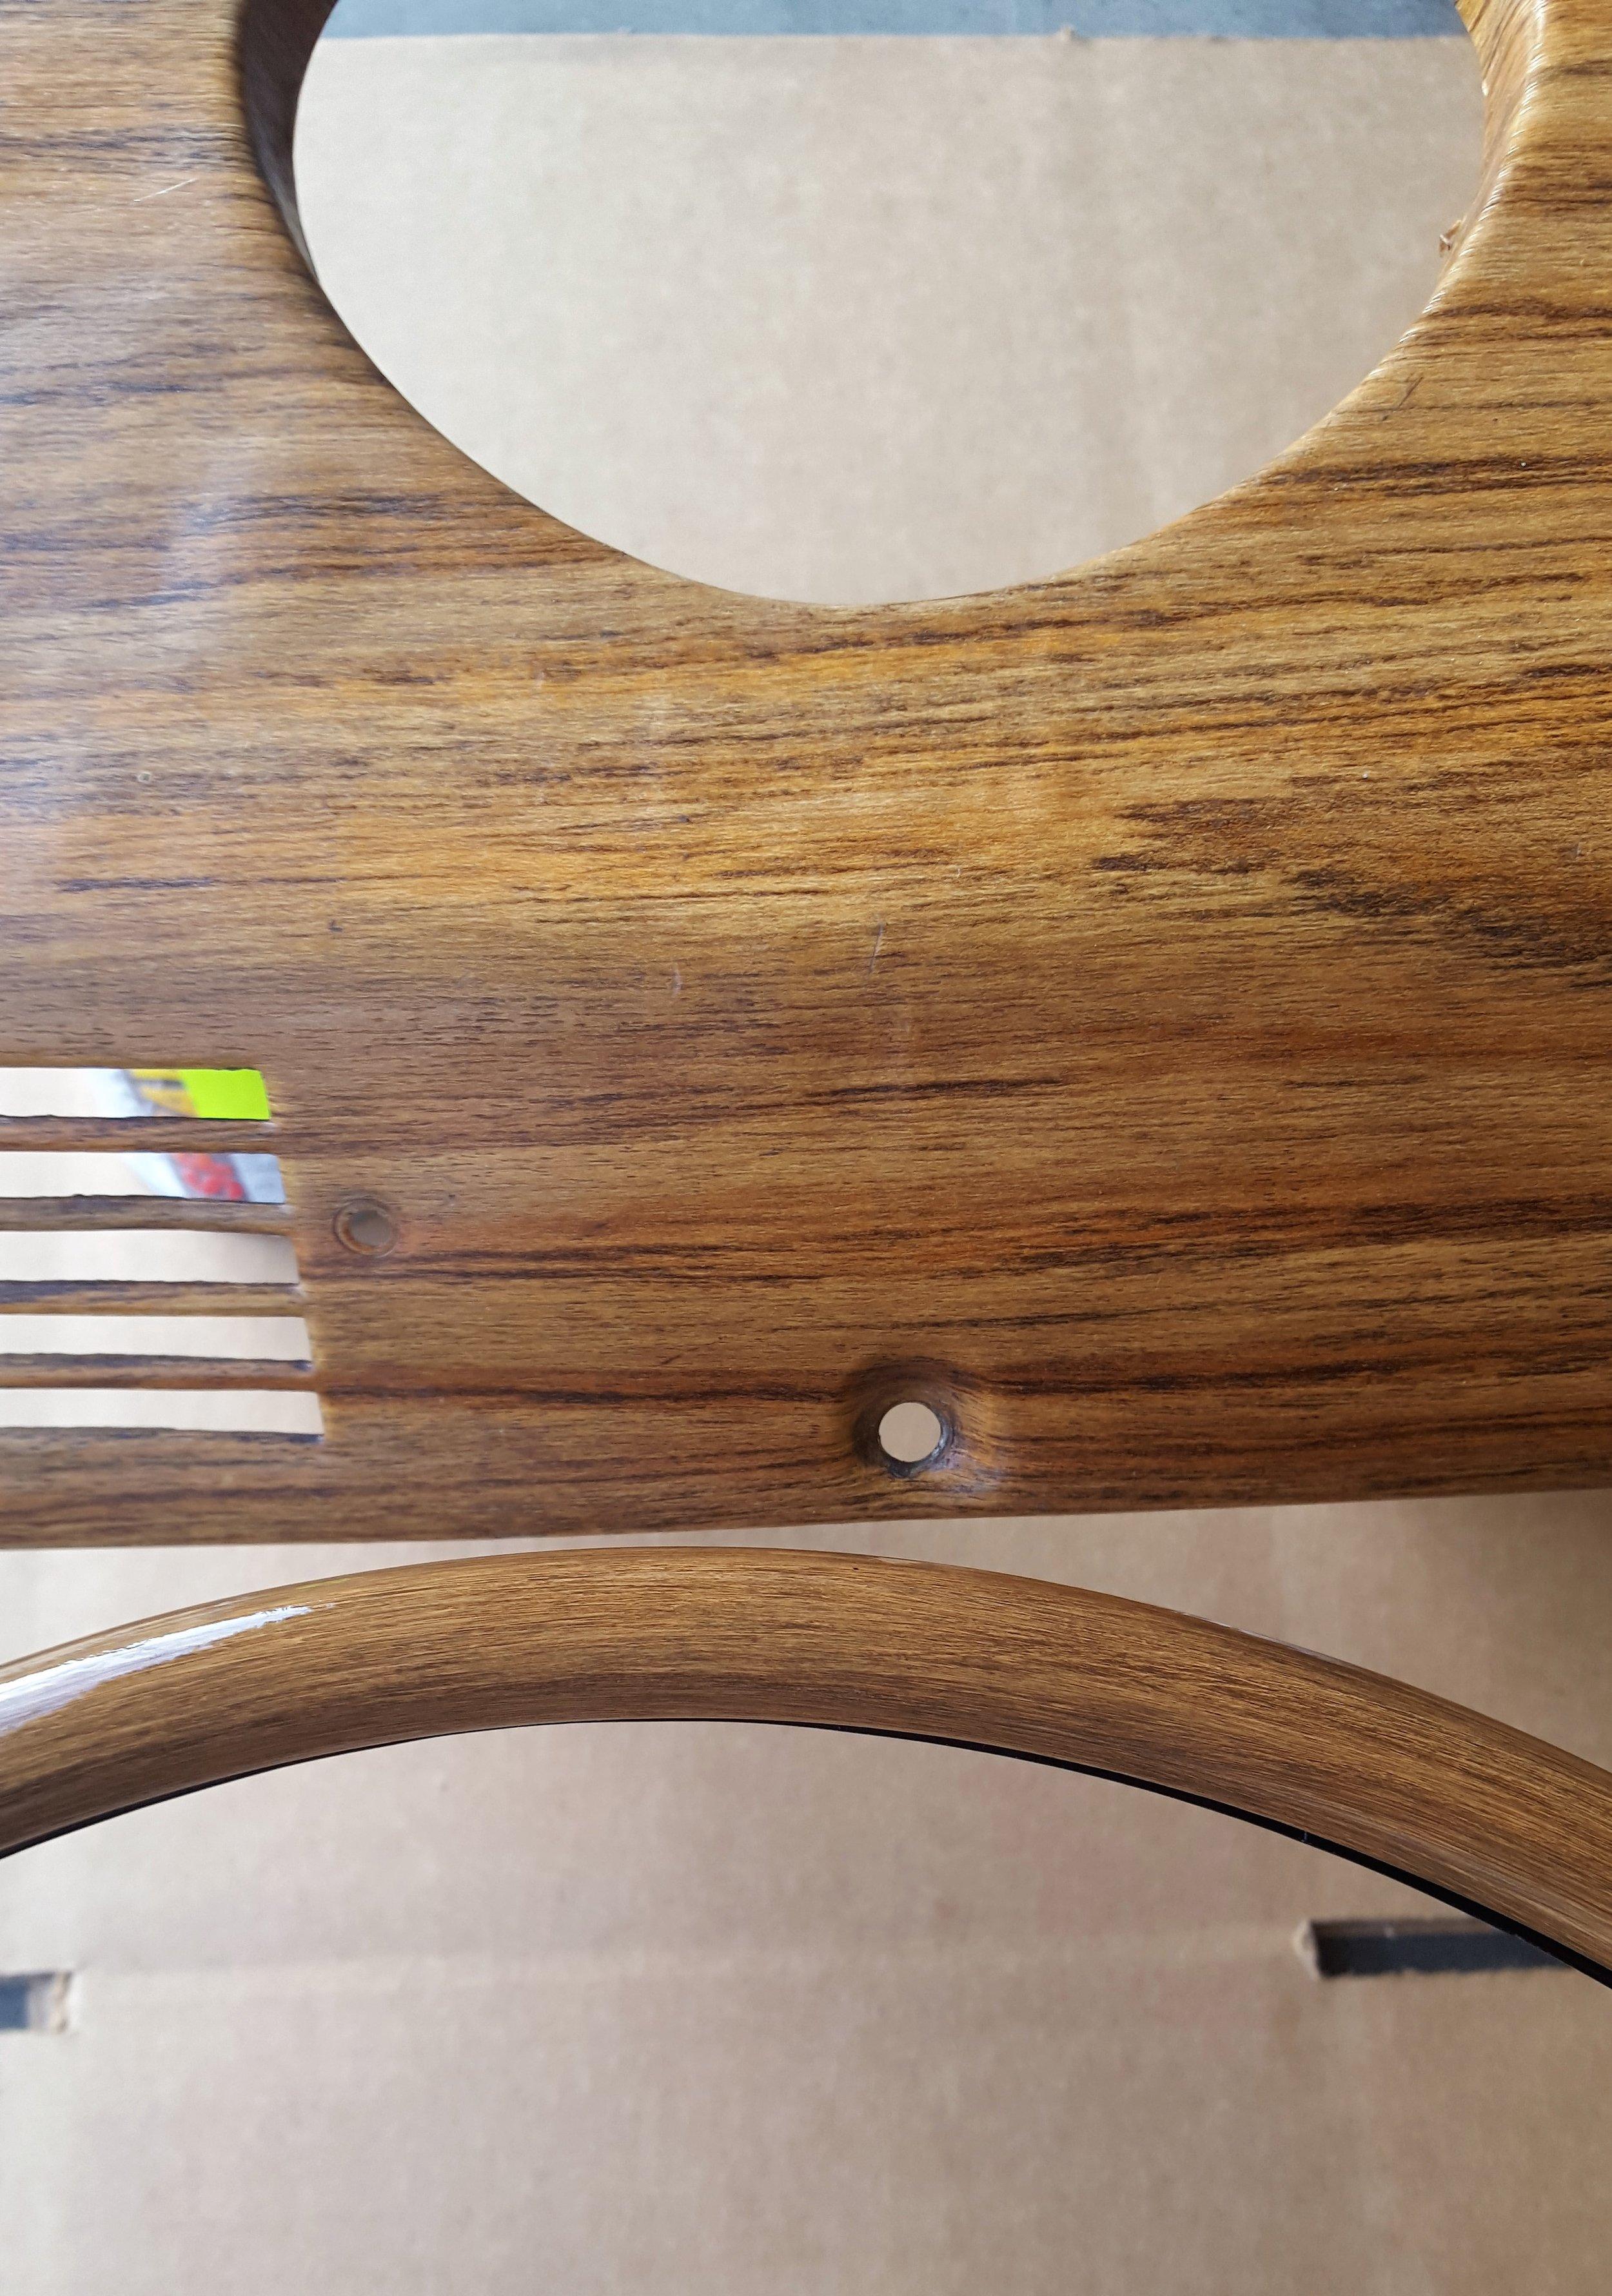 TEAK wood grain close up